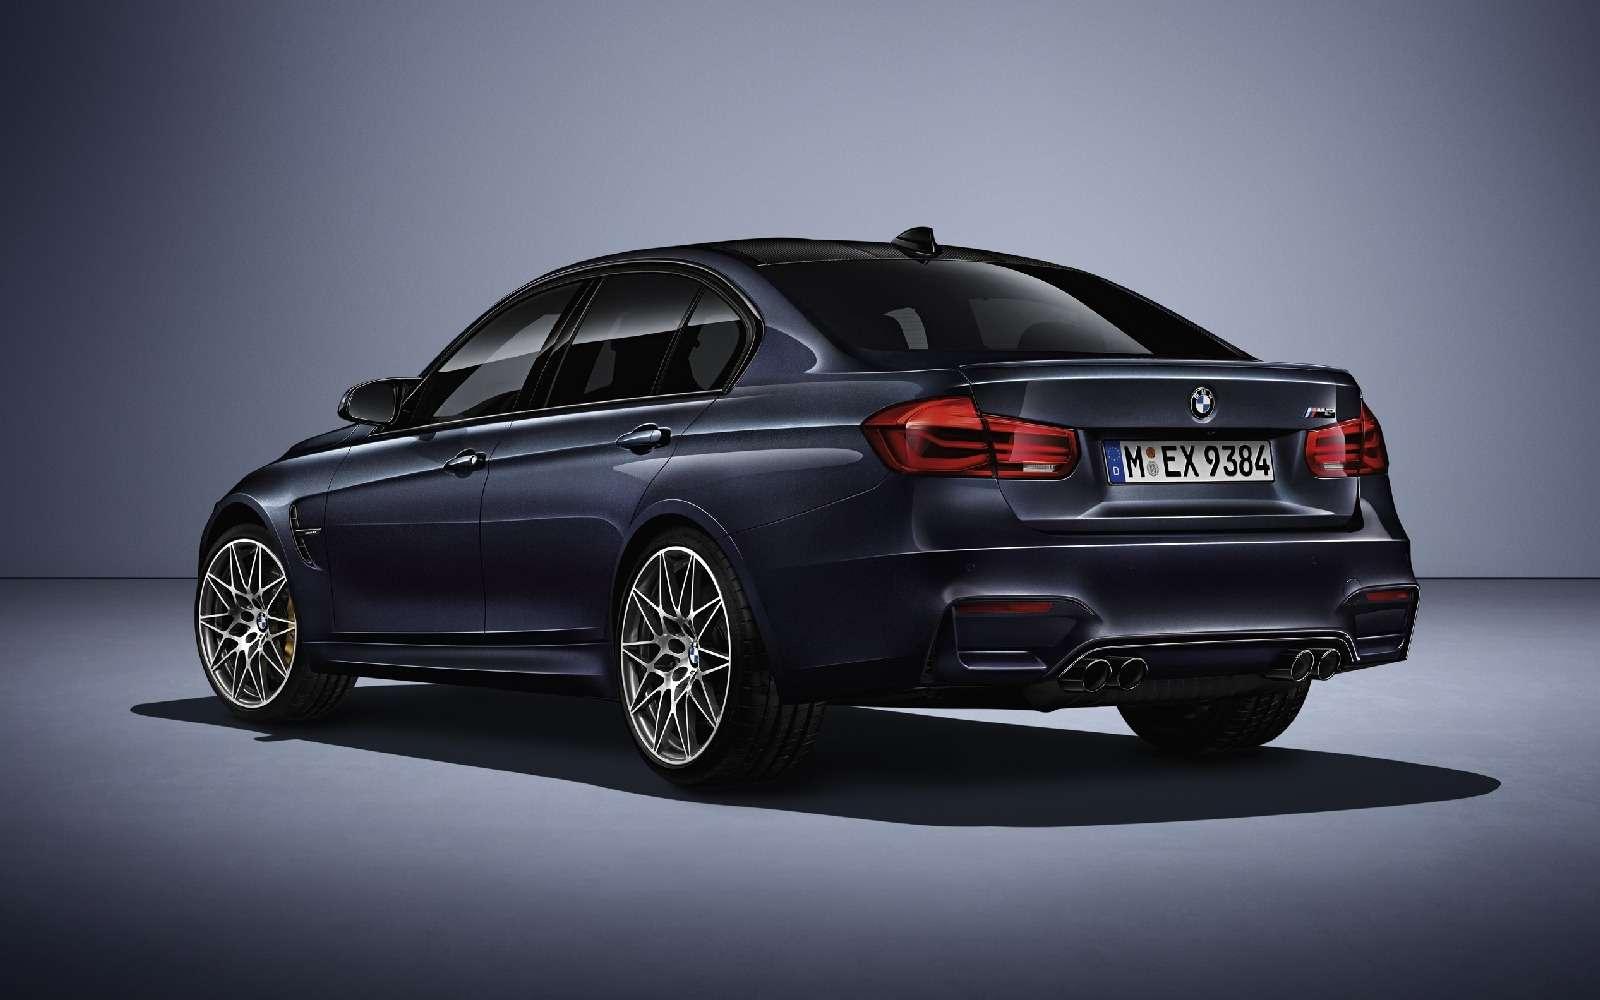 BMWM3отпразднует 30-летний юбилей с«лишними» дверьми— фото 593114